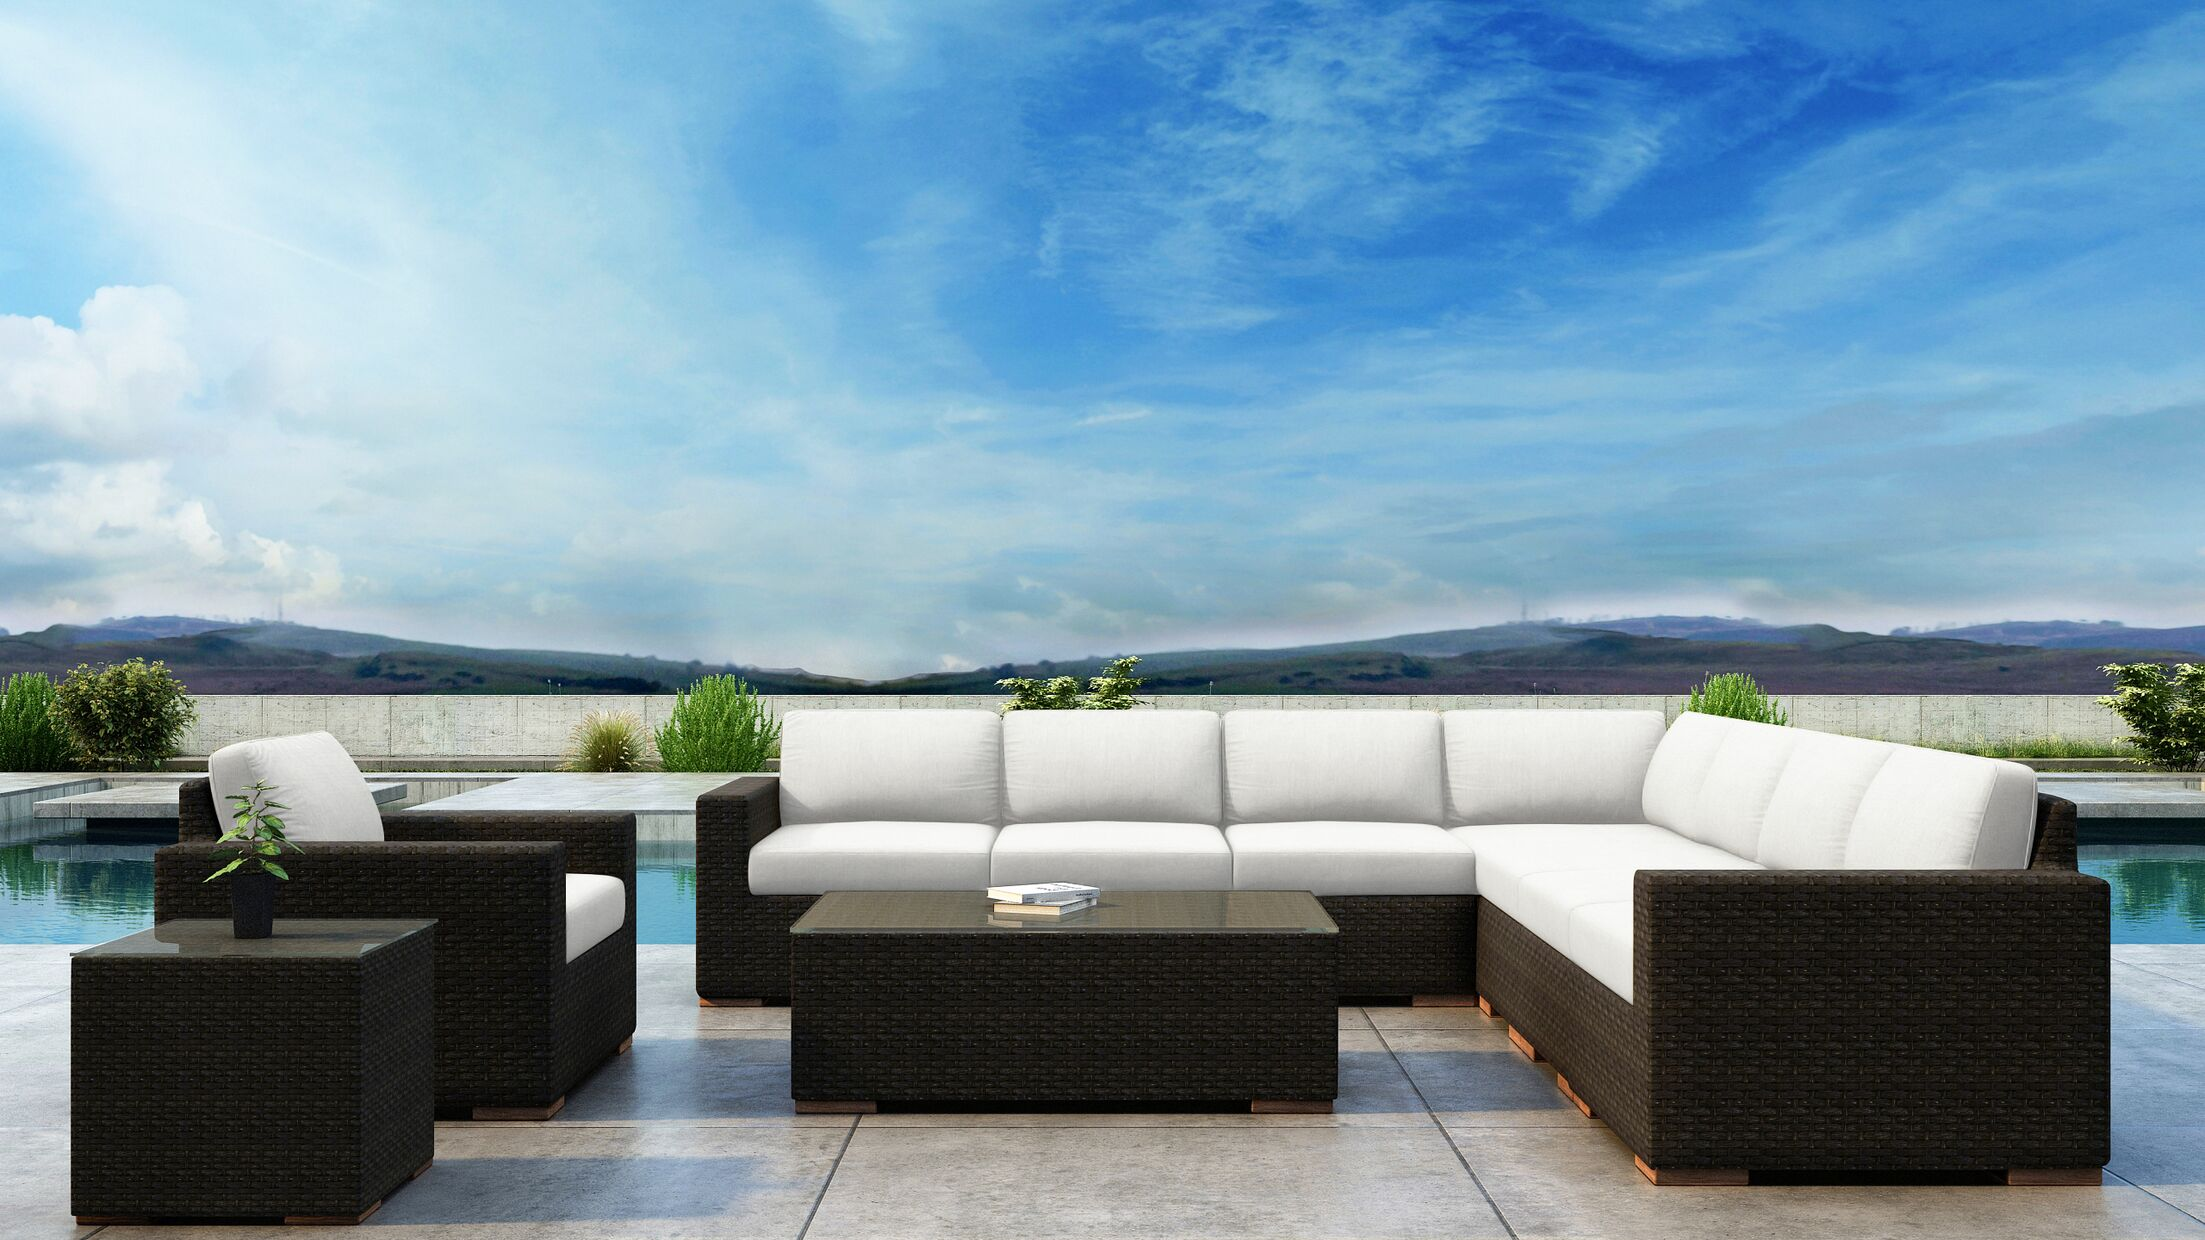 Glen Ellyn 10 Piece Sectional Set with Sunbrella Cushion Cushion Color: Canvas Natural